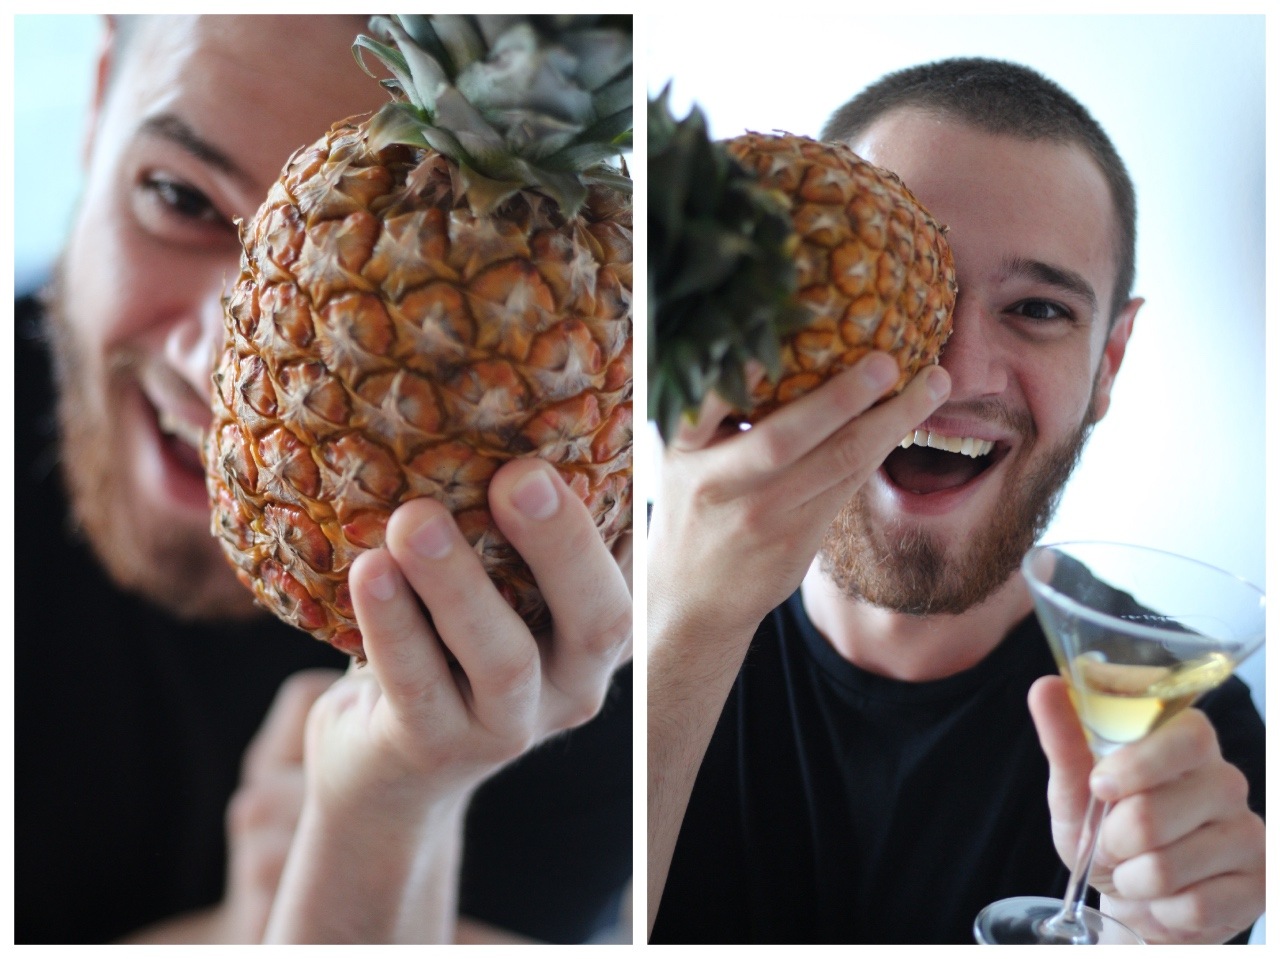 Mile i ananas